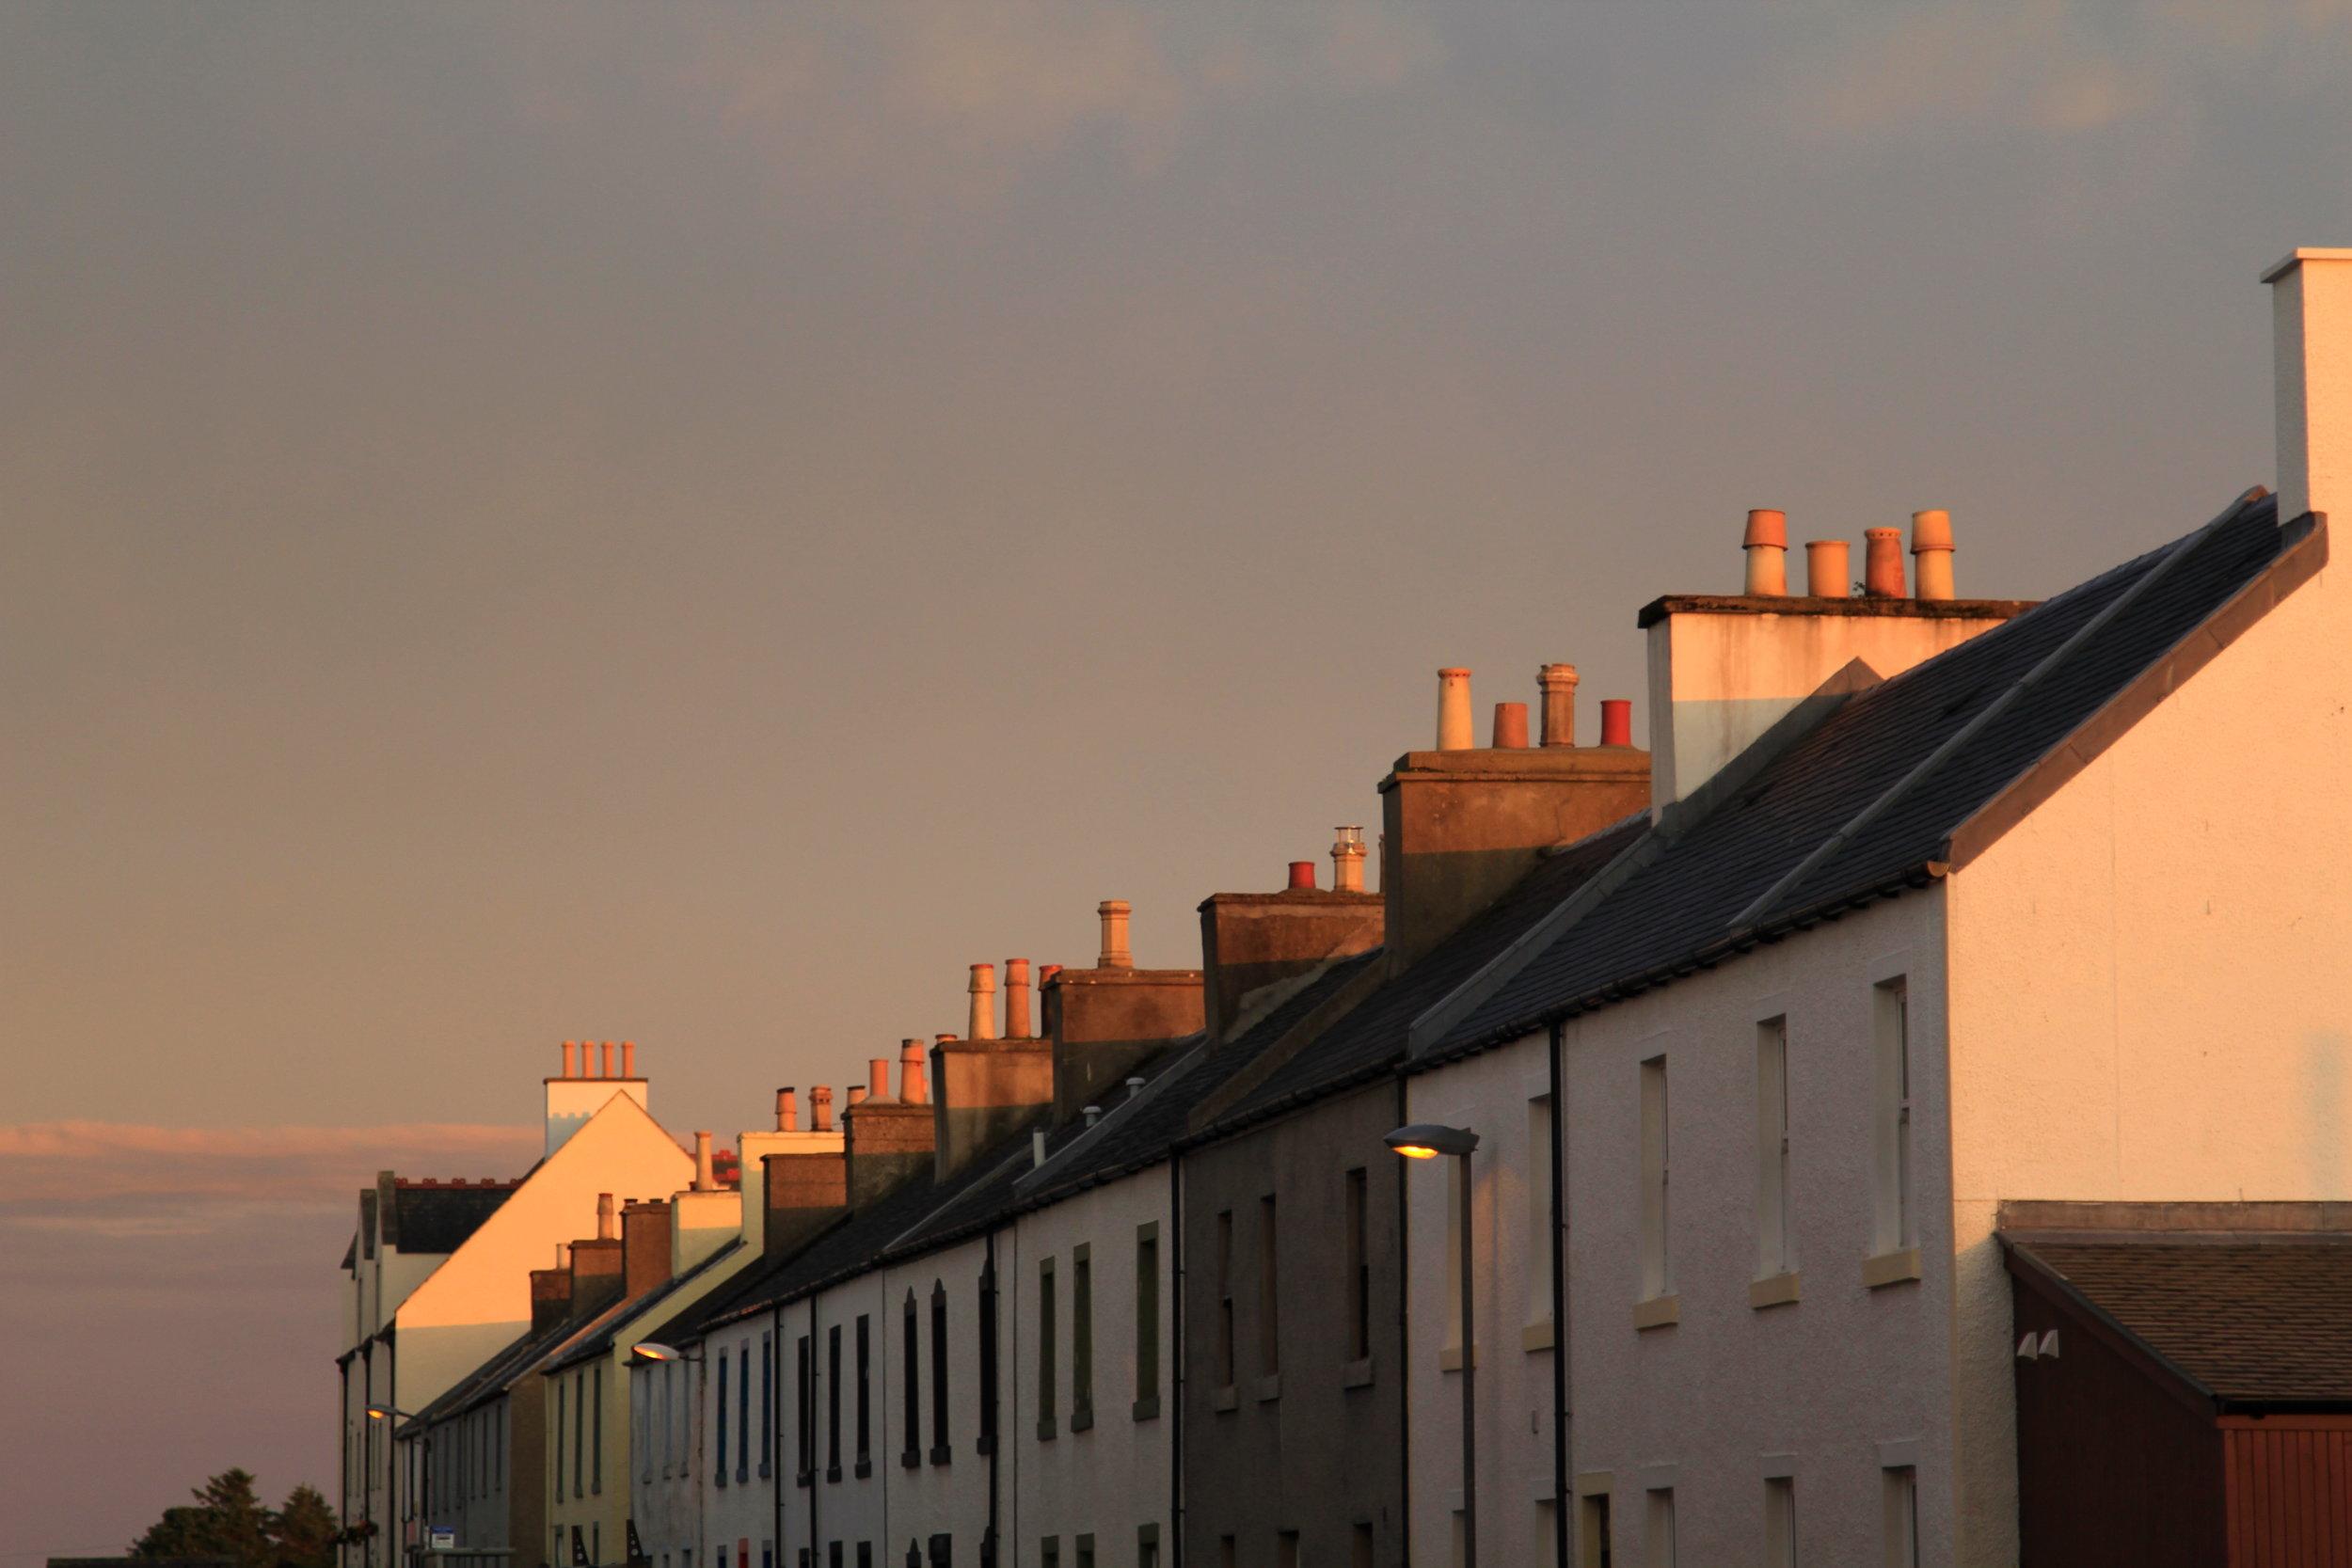 Golden hour in Islay, Scotland